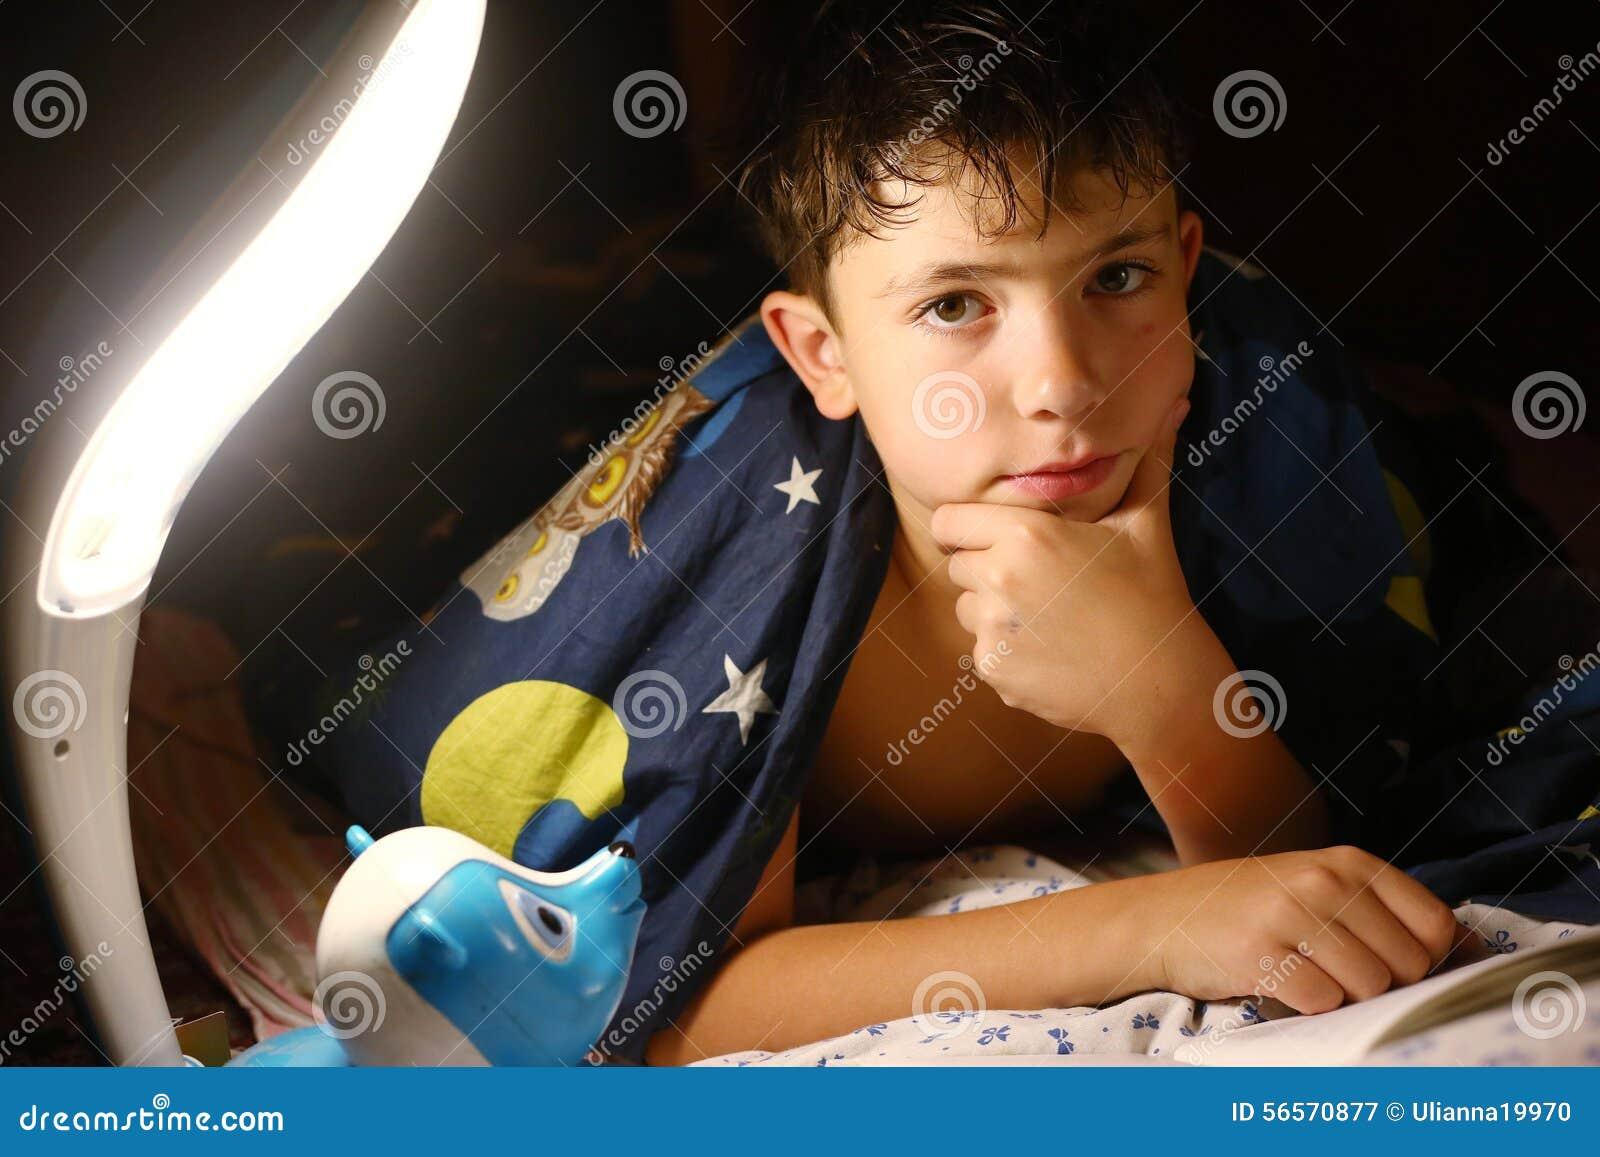 Download Όμορφο διαβασμένο αγόρι βιβλίο Preteen με το λαμπτήρα πριν από τον ύπνο Στοκ Εικόνα - εικόνα από καυκάσιος, καλμένη: 56570877